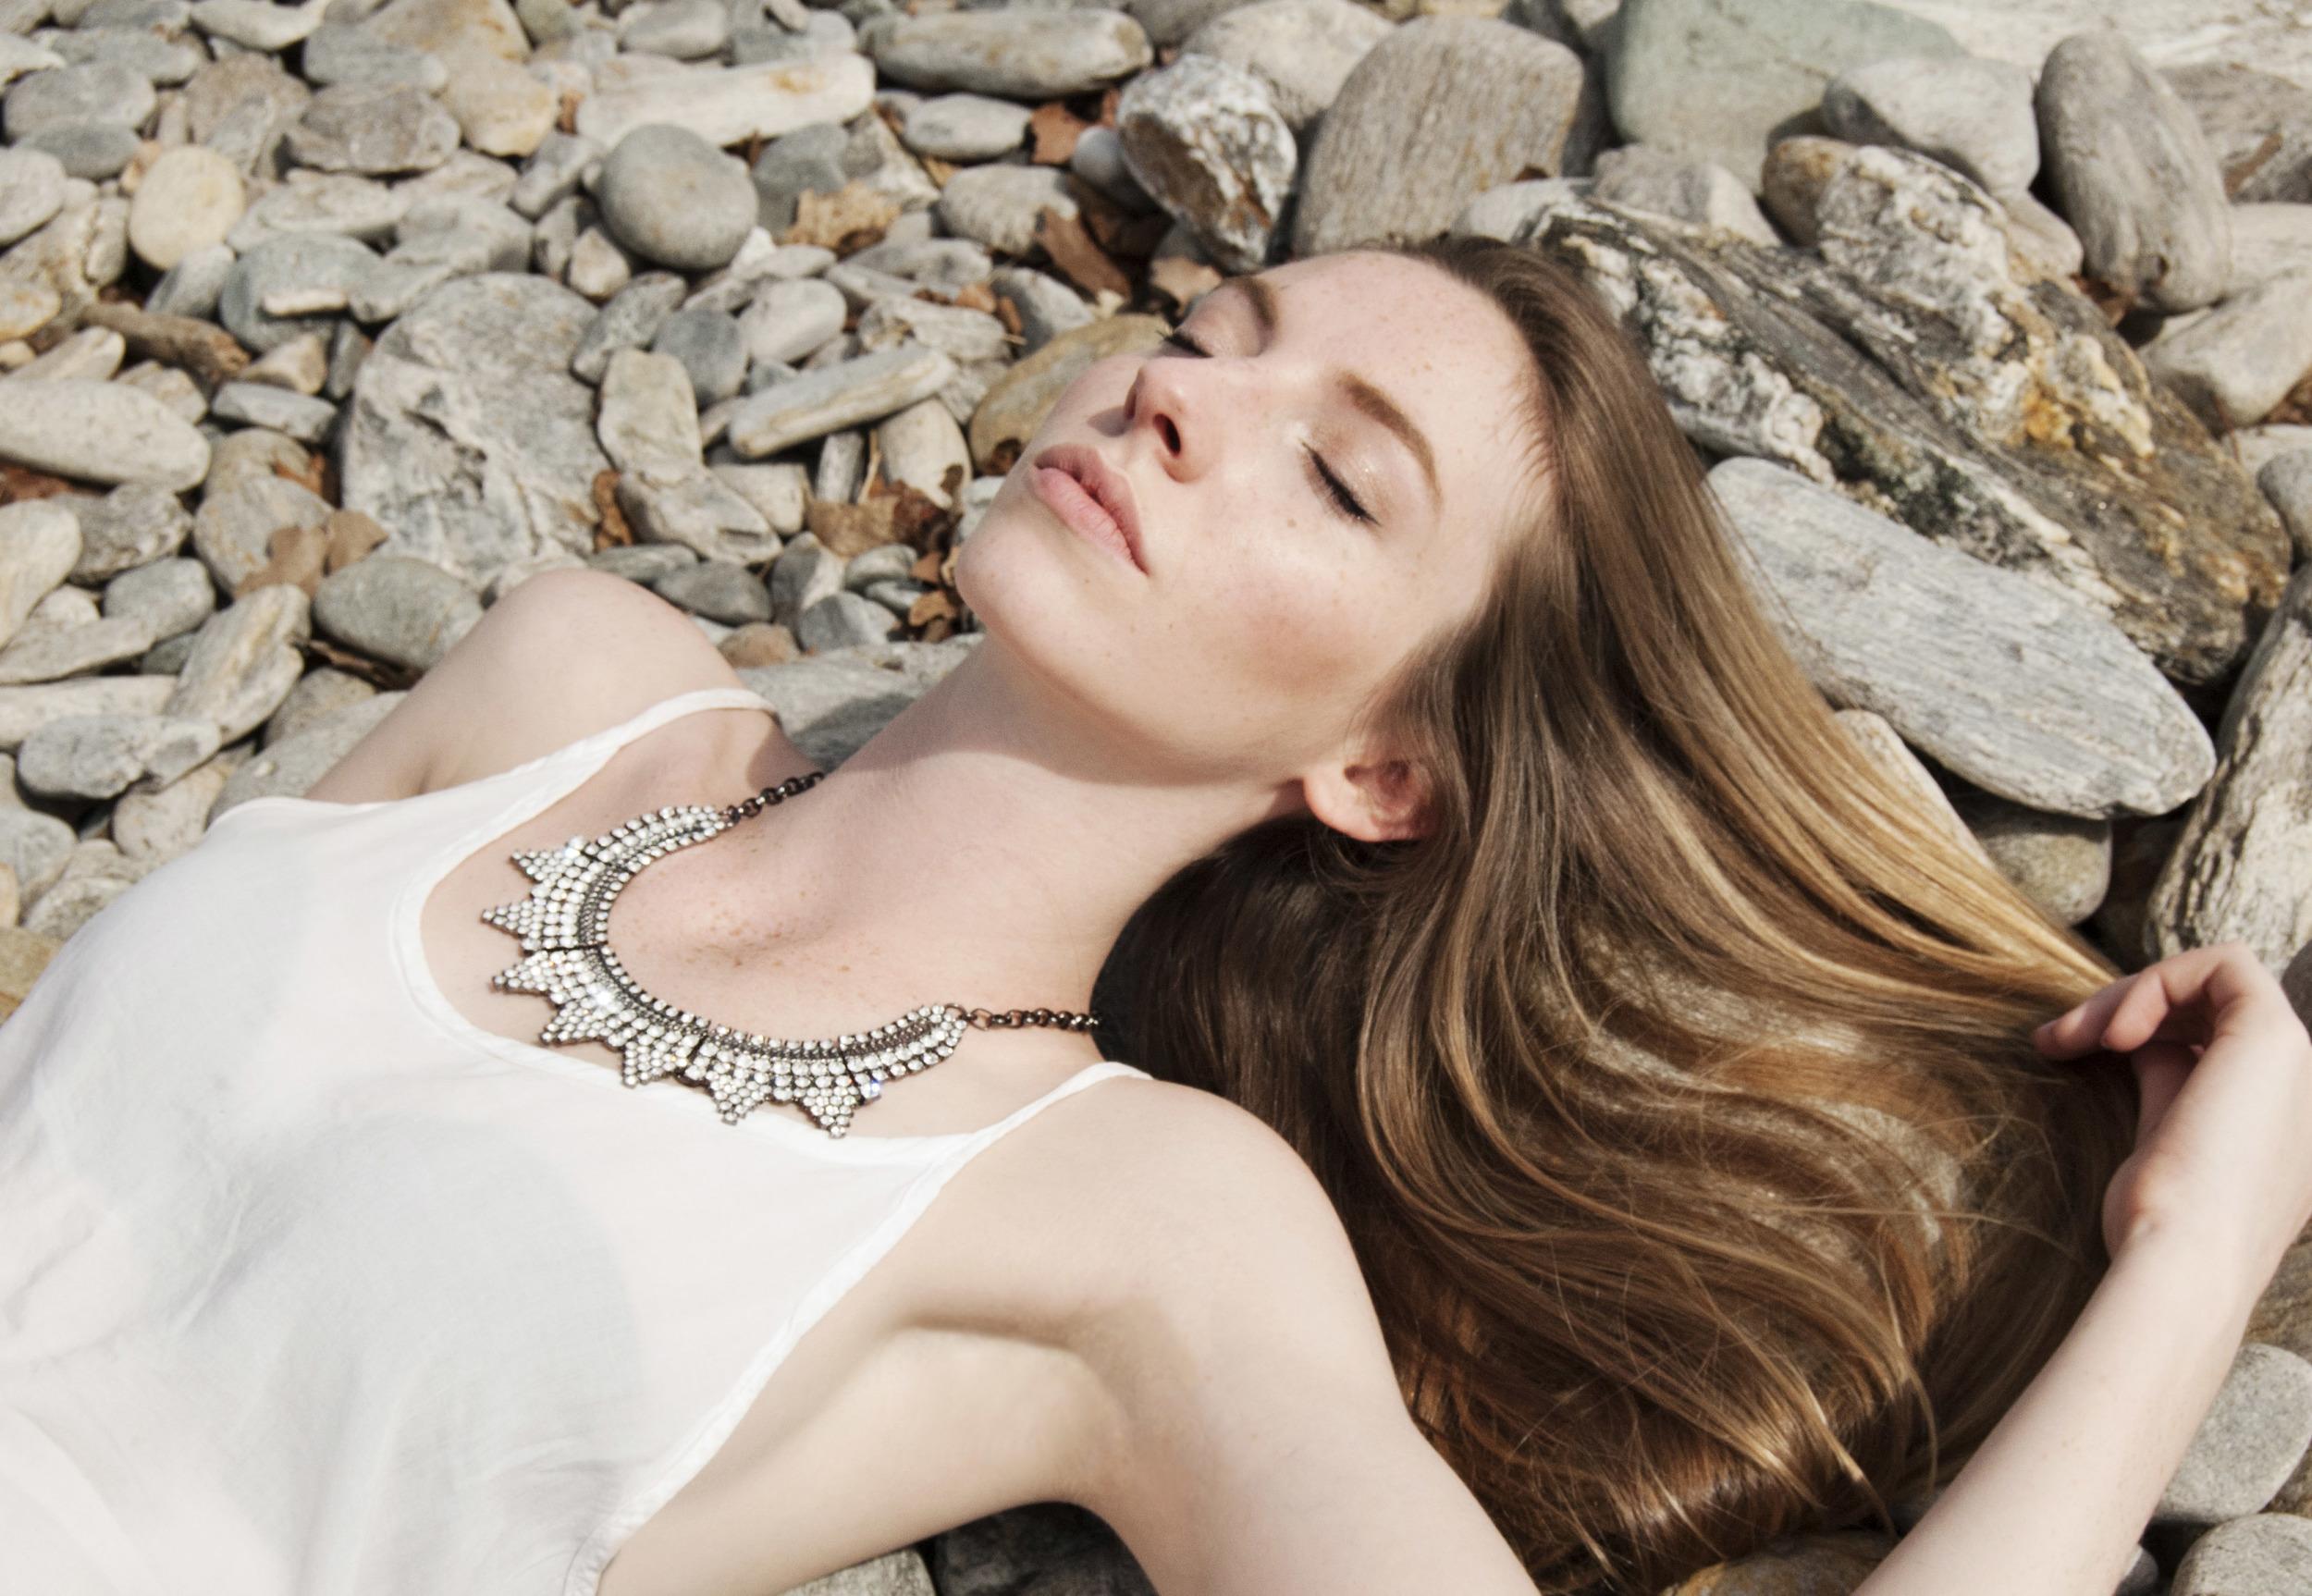 Jewel Rules (Girl x Garment). One month of free Rocksbox with code: girlxgarmentxoxo